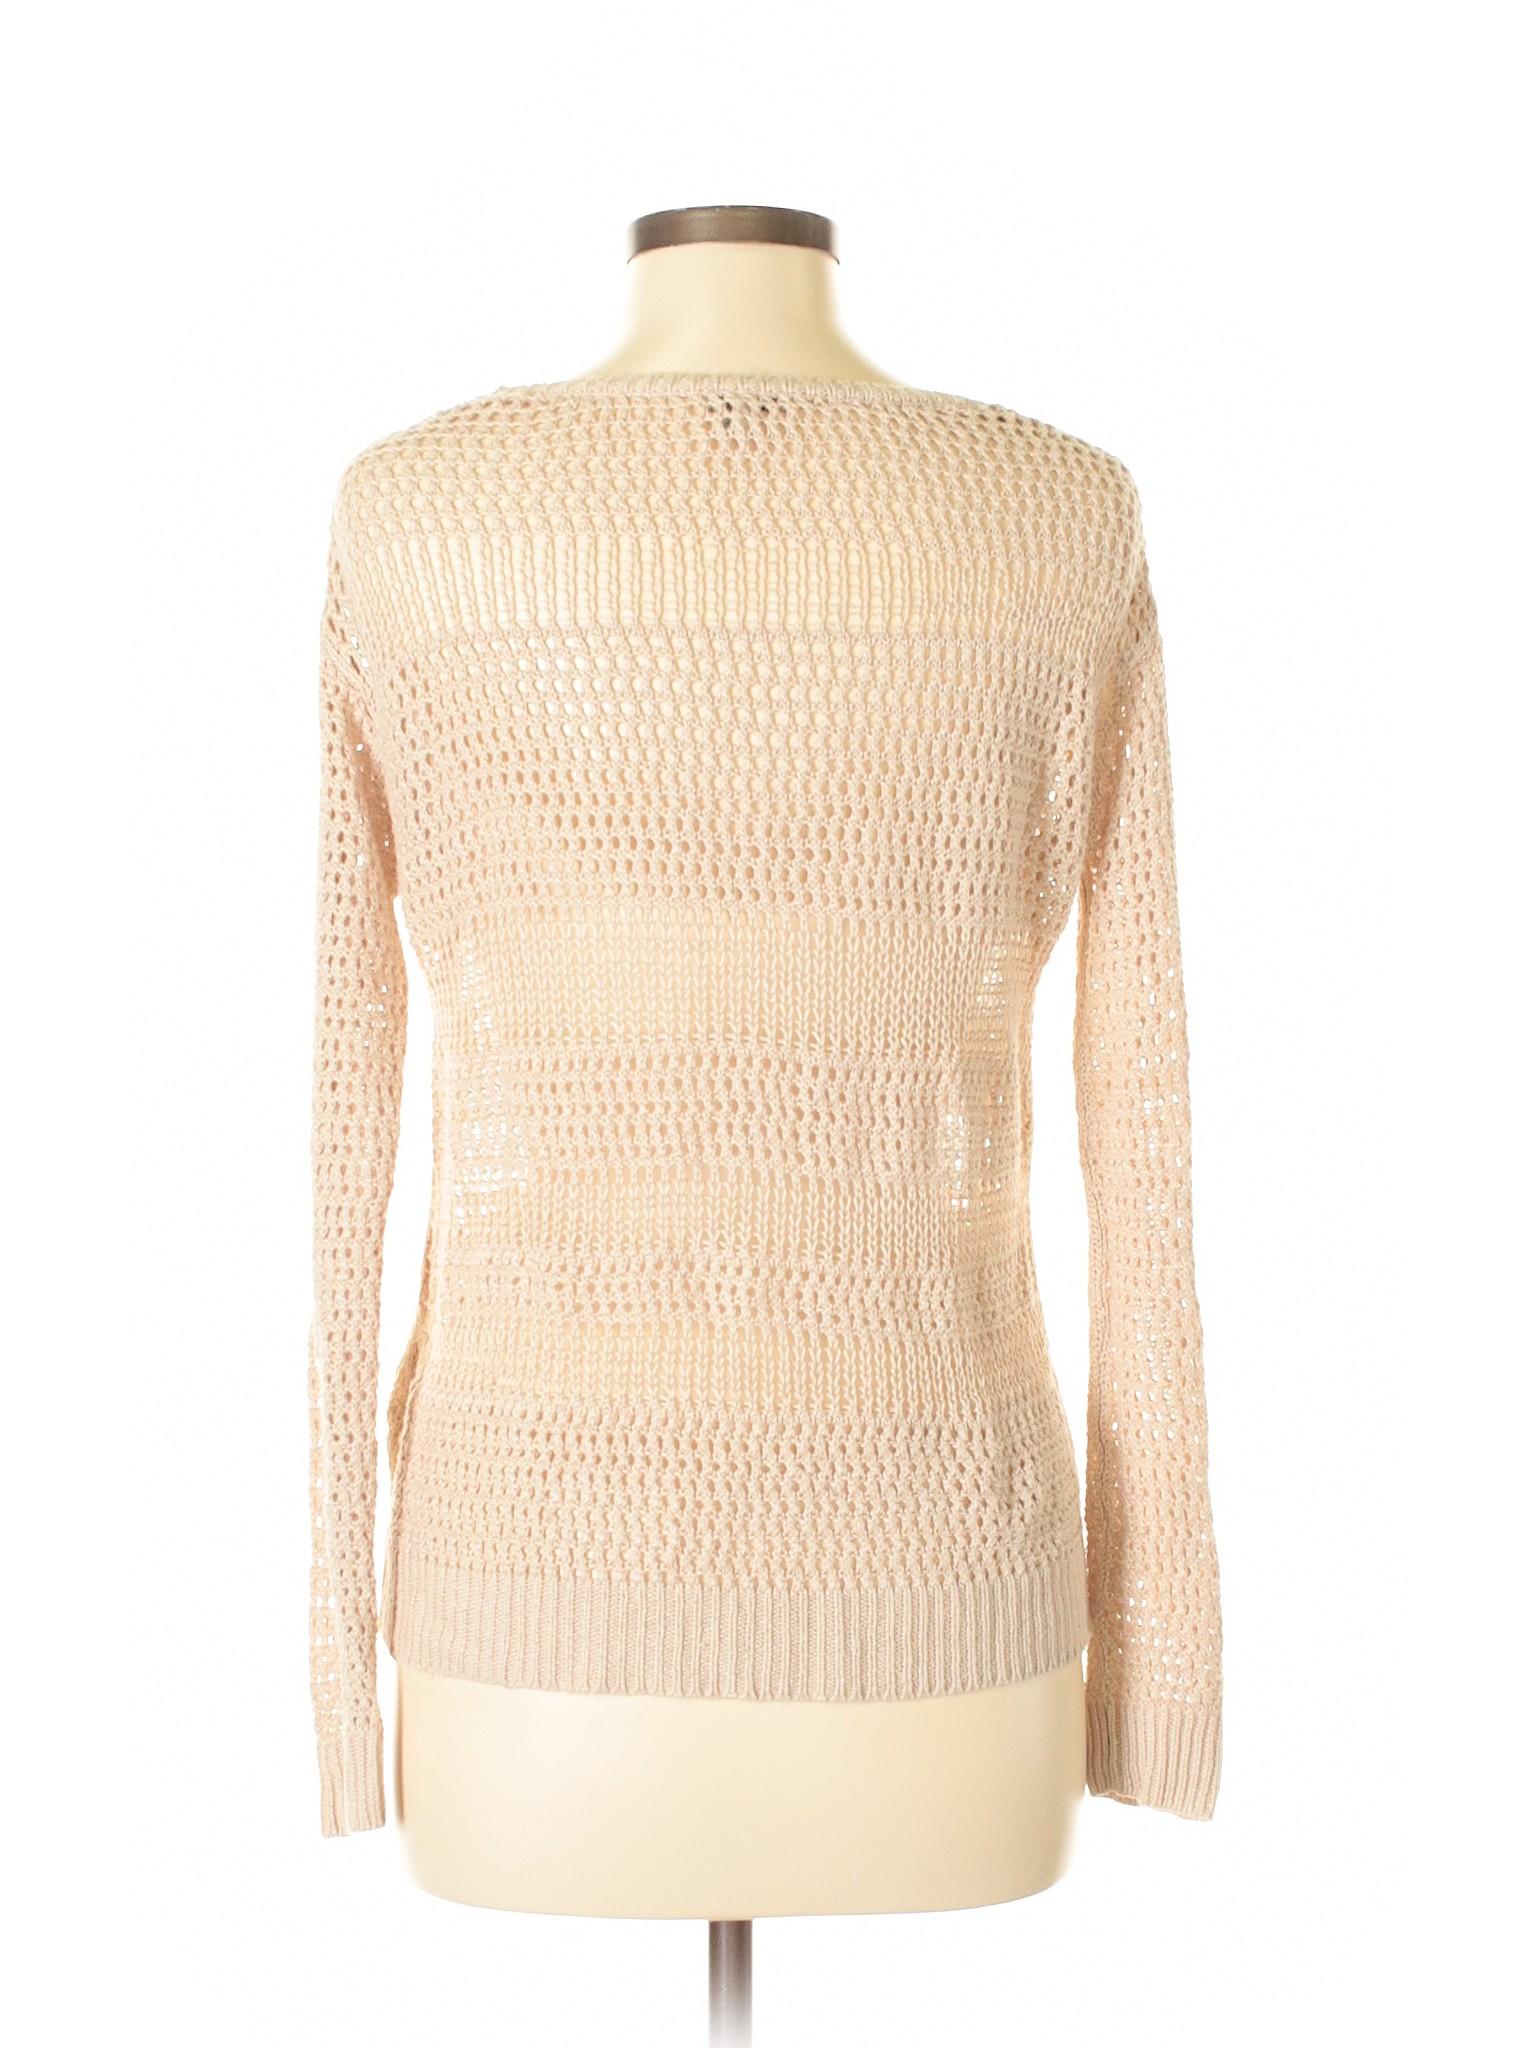 Boutique Pullover Boutique Joie Joie Sweater S5v1wq